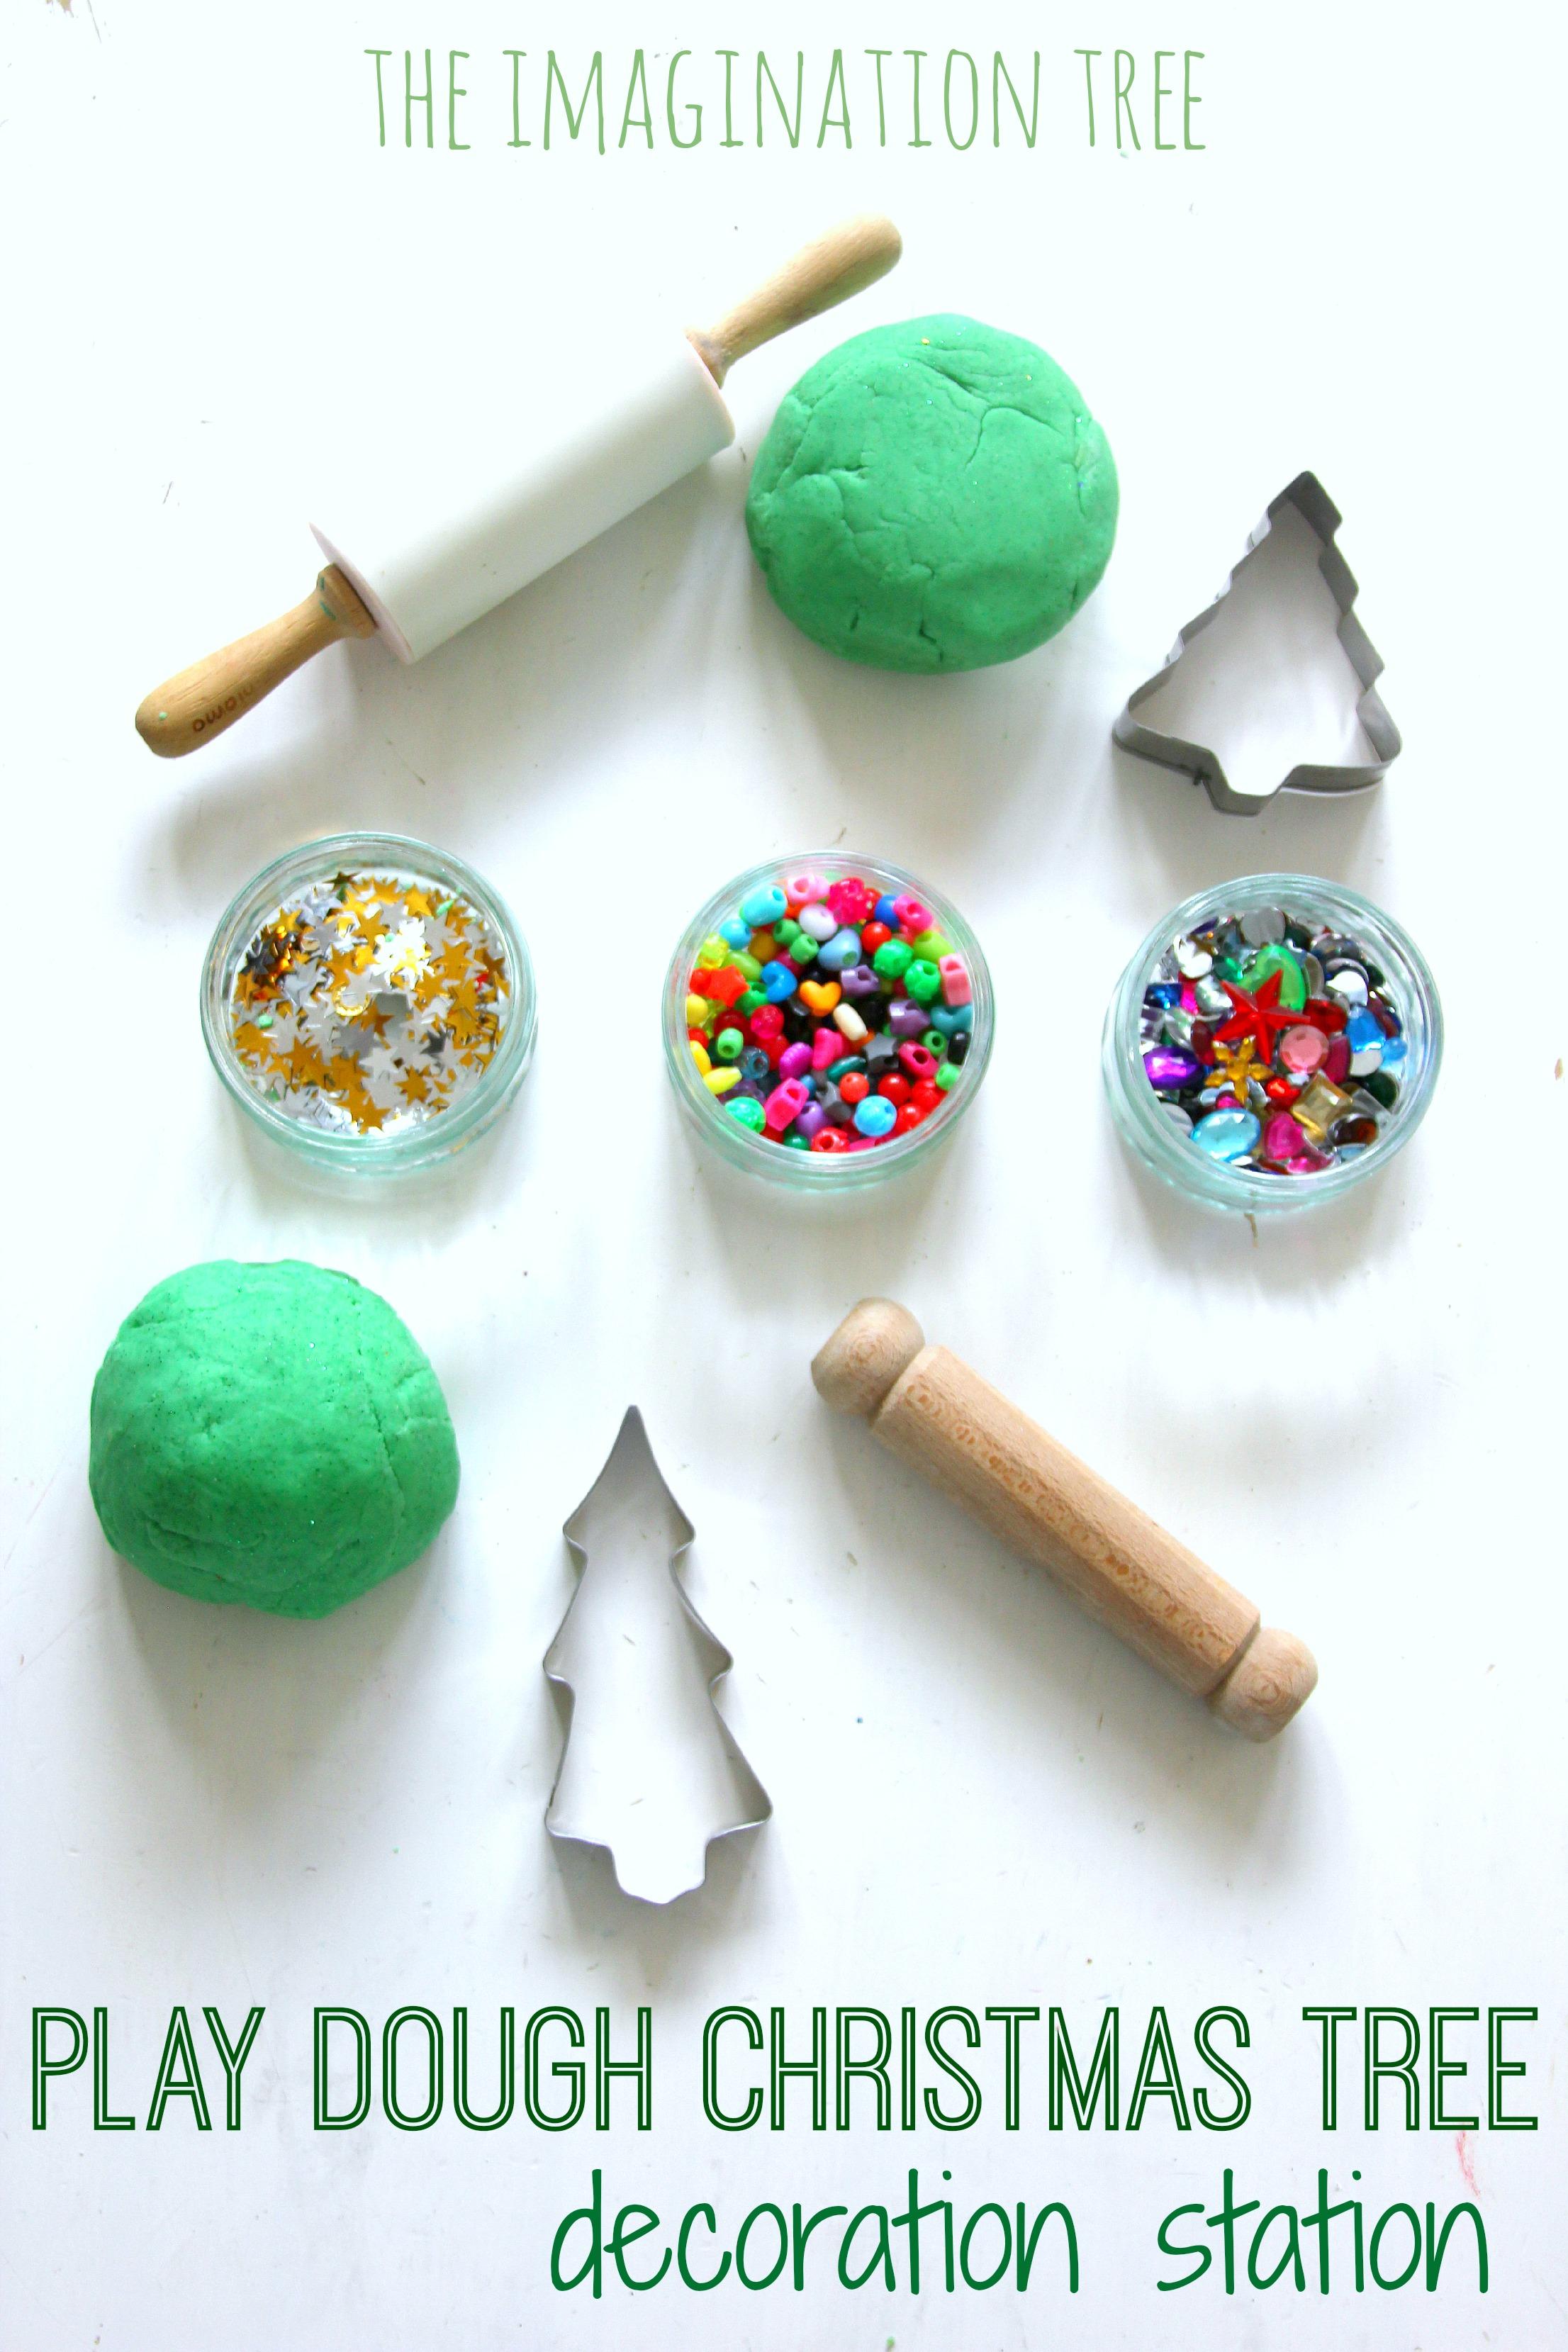 Play Dough Christmas Tree Decoration